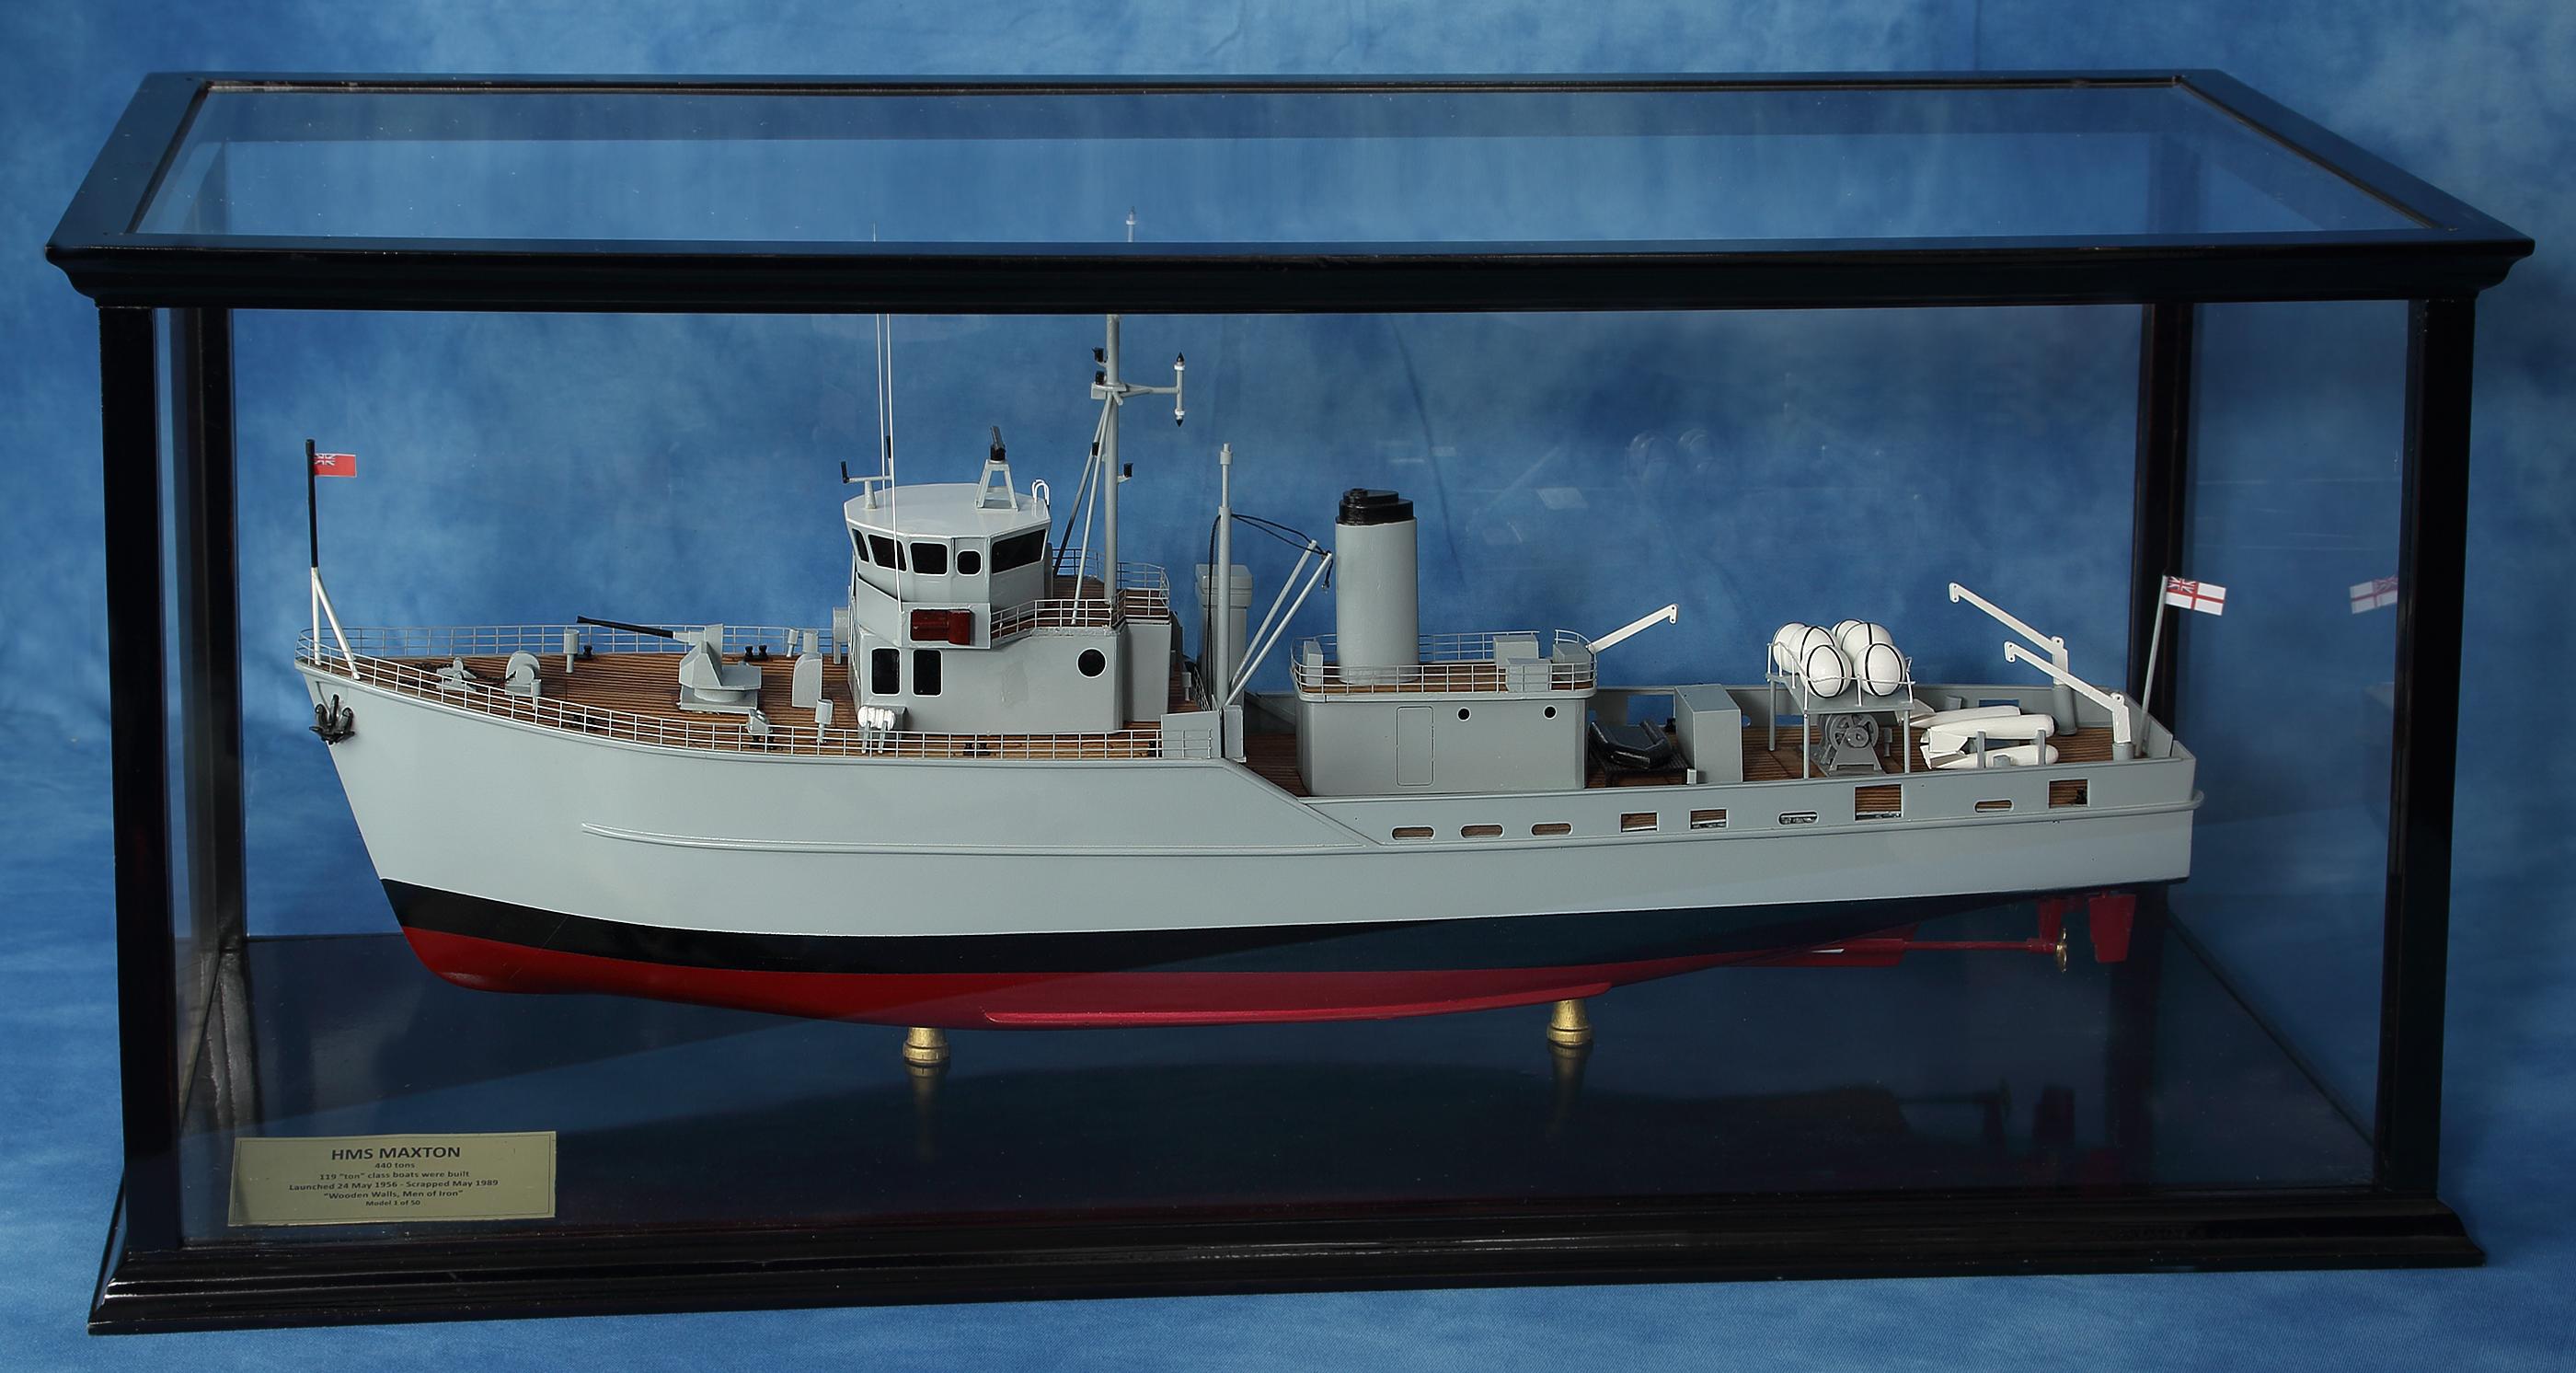 HMS MAXTON